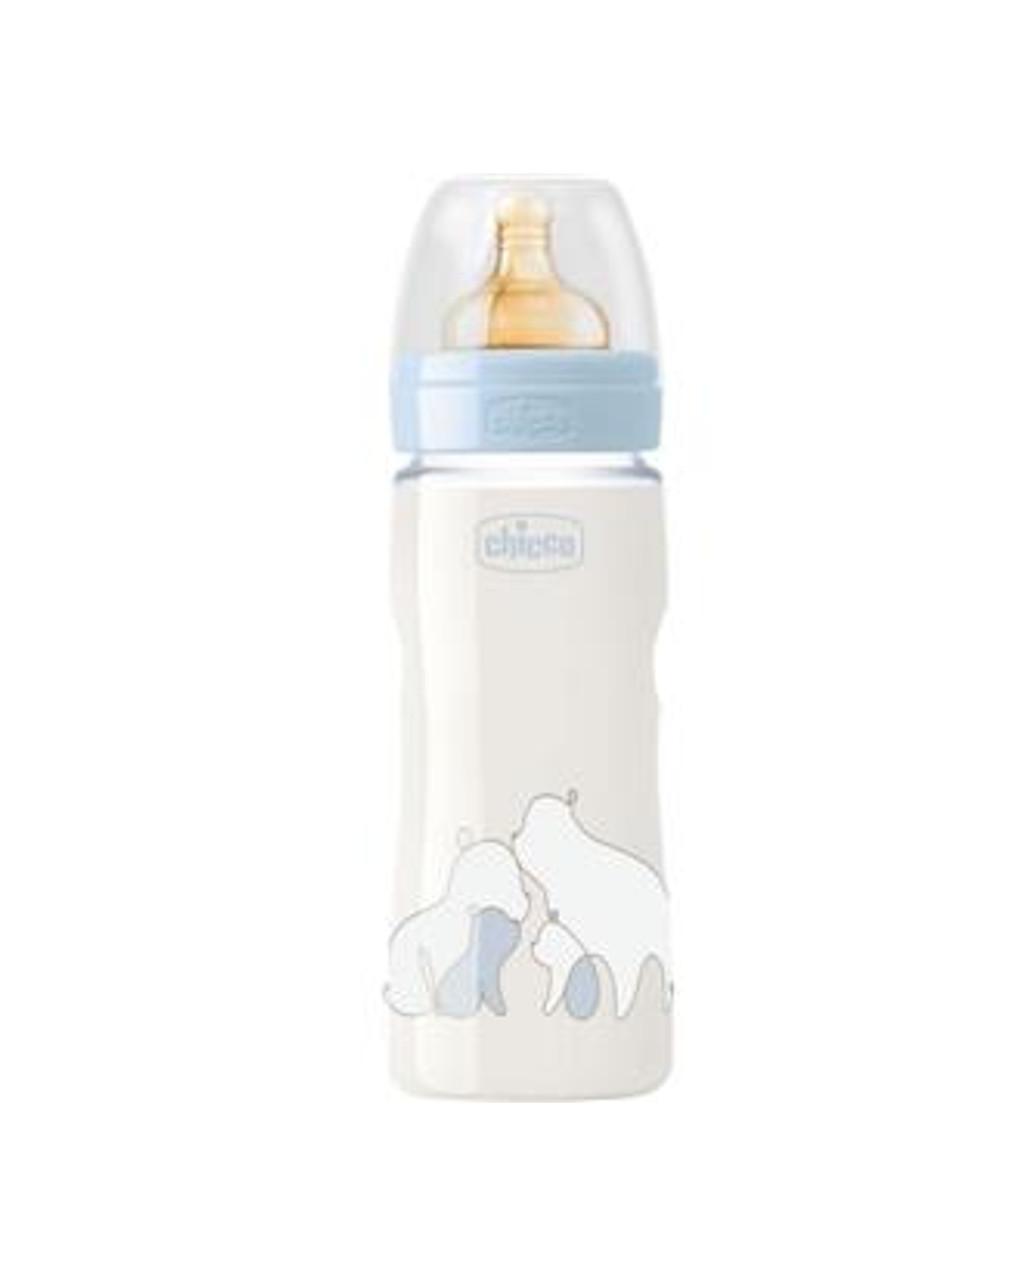 Biberon original touch 330 ml azzurro flusso regolabile  caucciu - Chicco